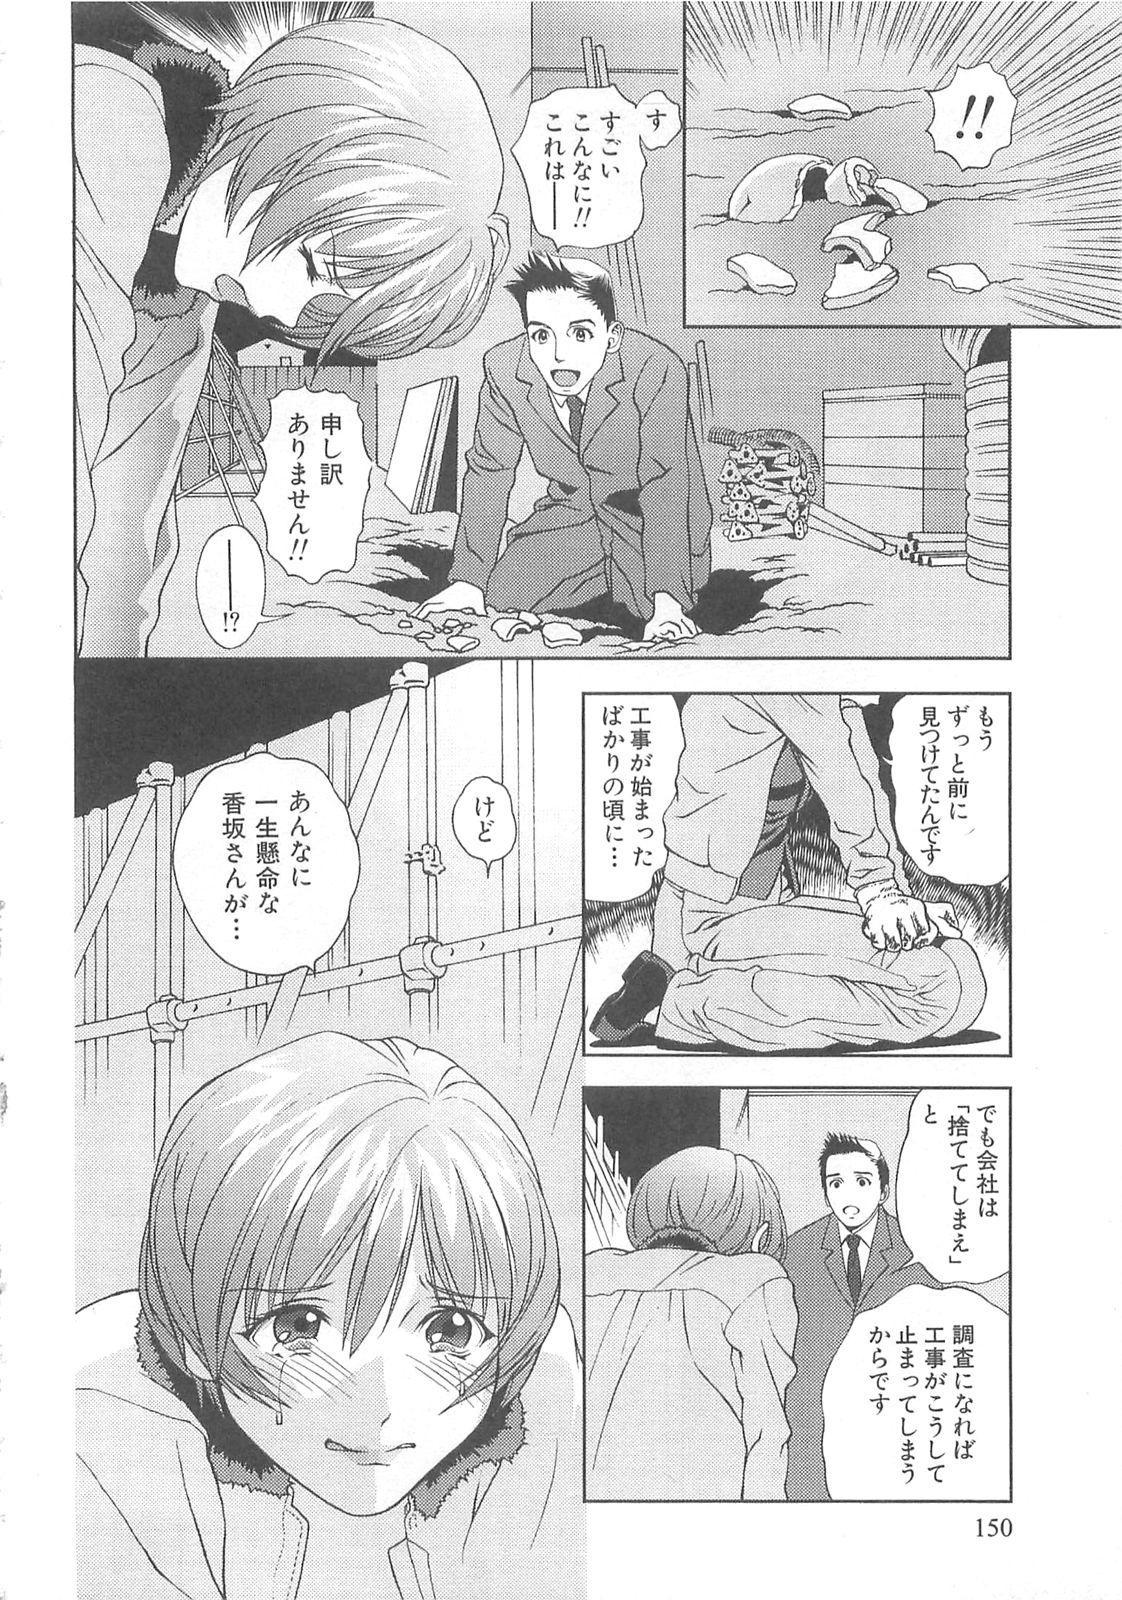 Tenshi no Kyuu - Angel's Pretty Hip 150